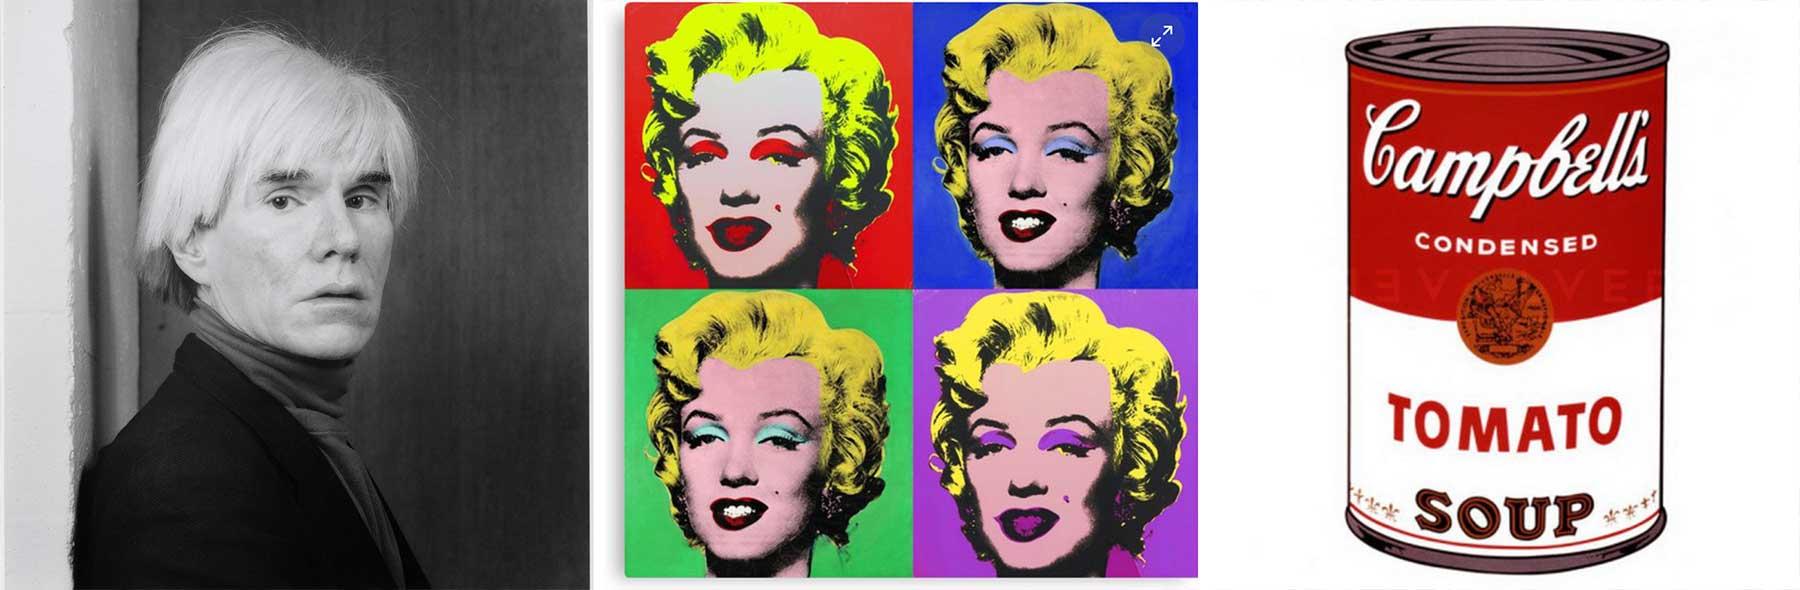 Wenn klassische Maler moderne Logos hätten if-painters-had-logos-Milton-Omena_22